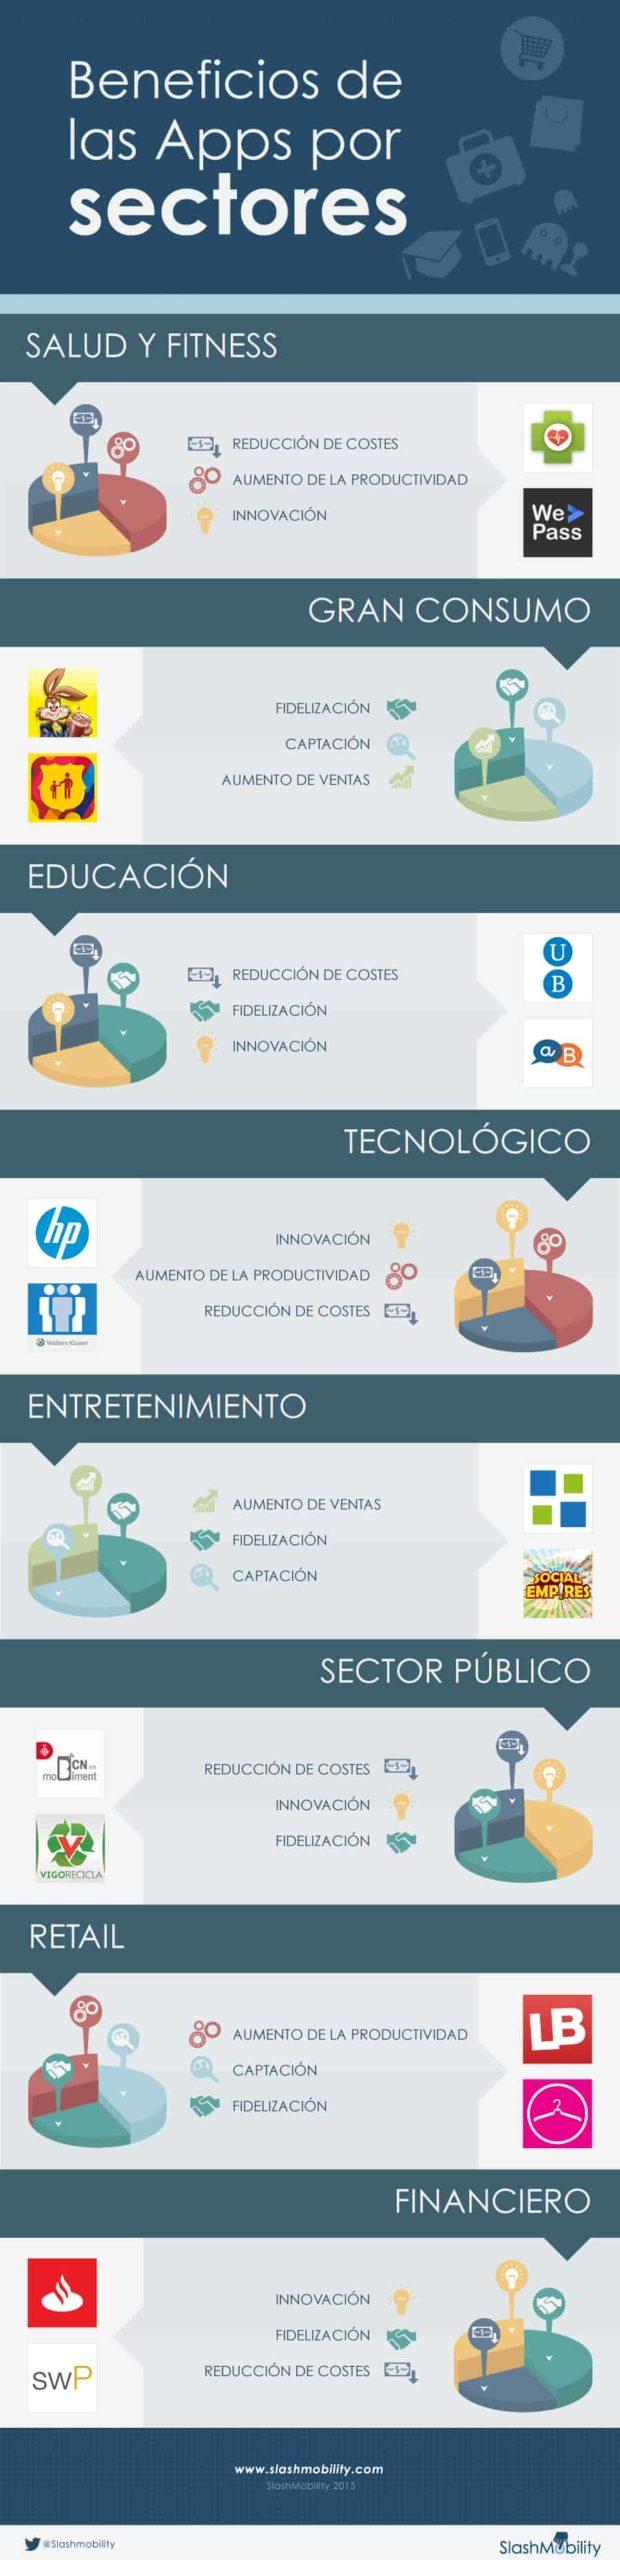 infografia beneficios de las apps